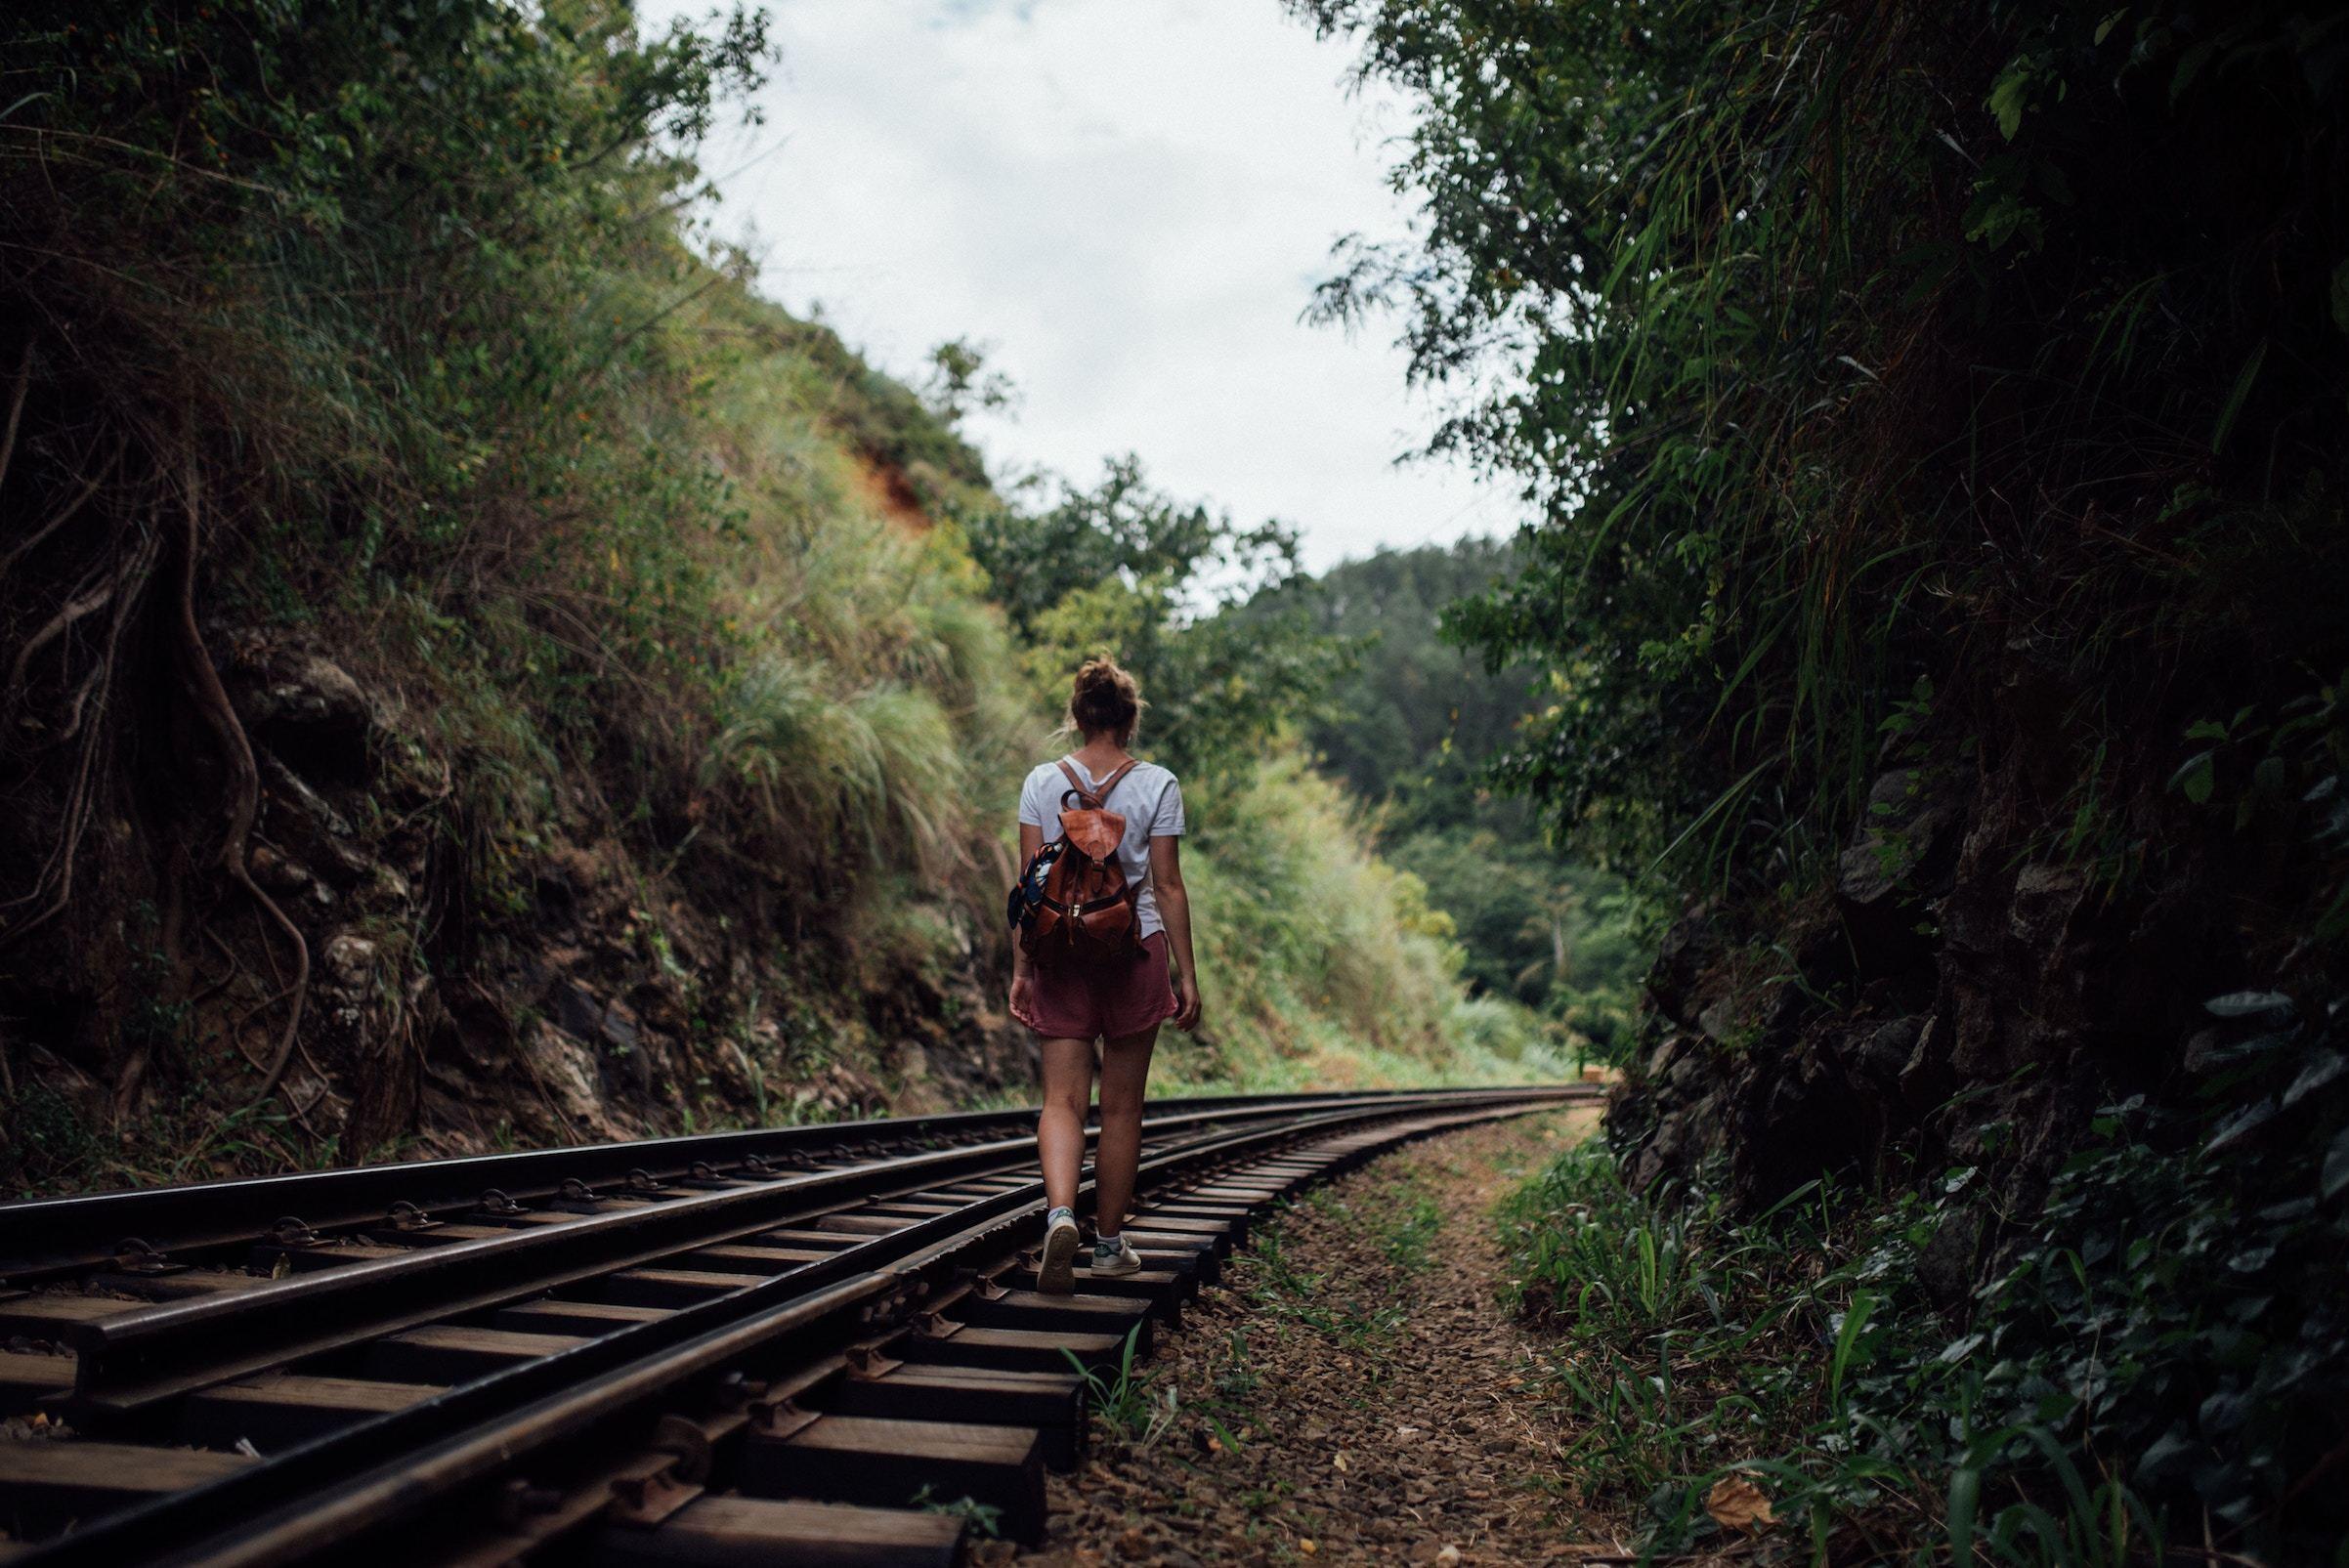 Woman walking along rural train tracks